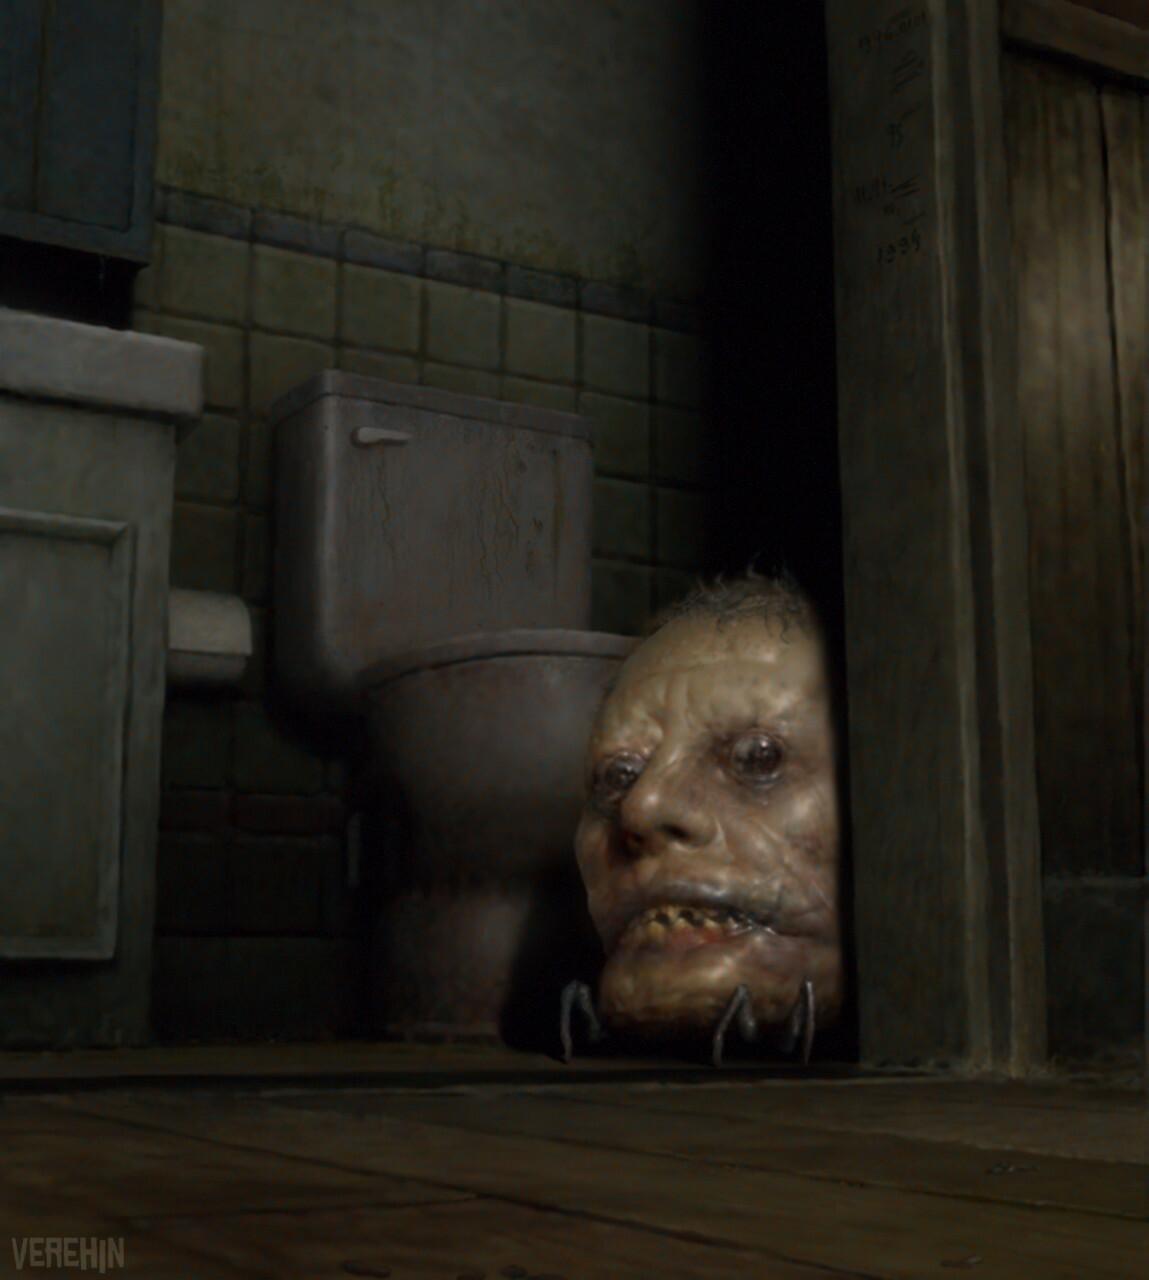 Rustle in the bathroom